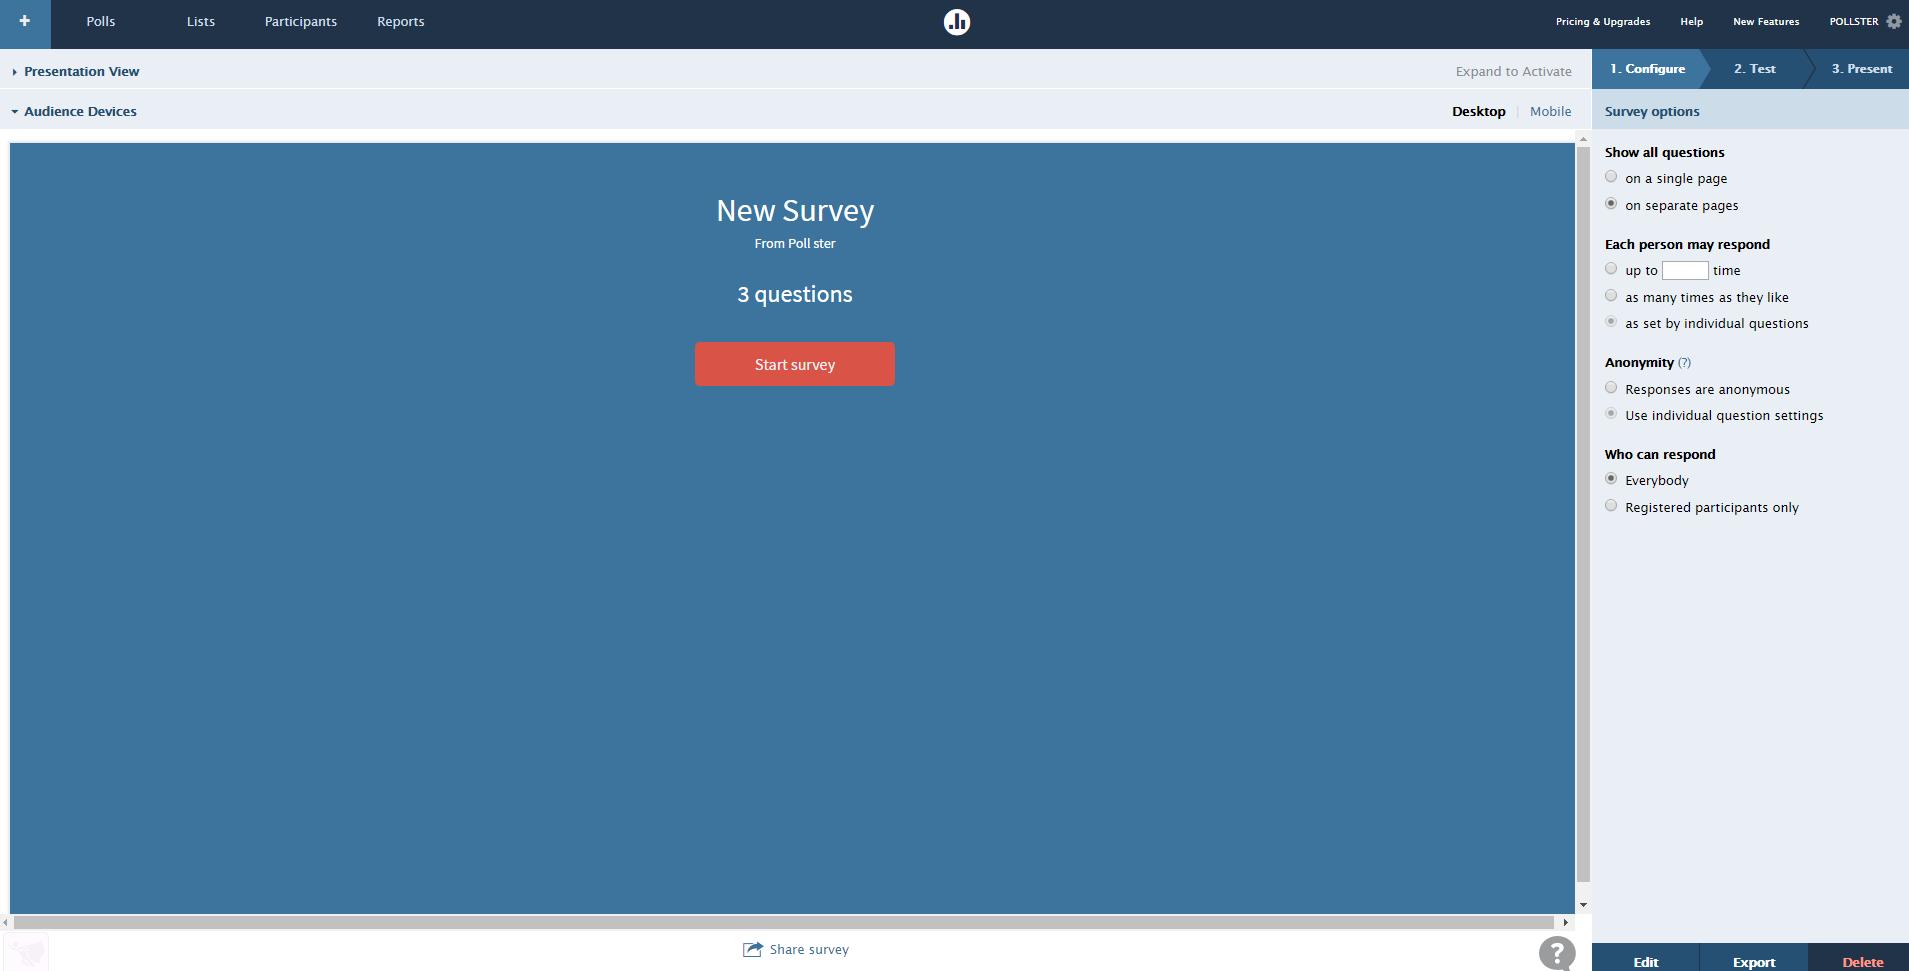 Multi-poll survey: step 3